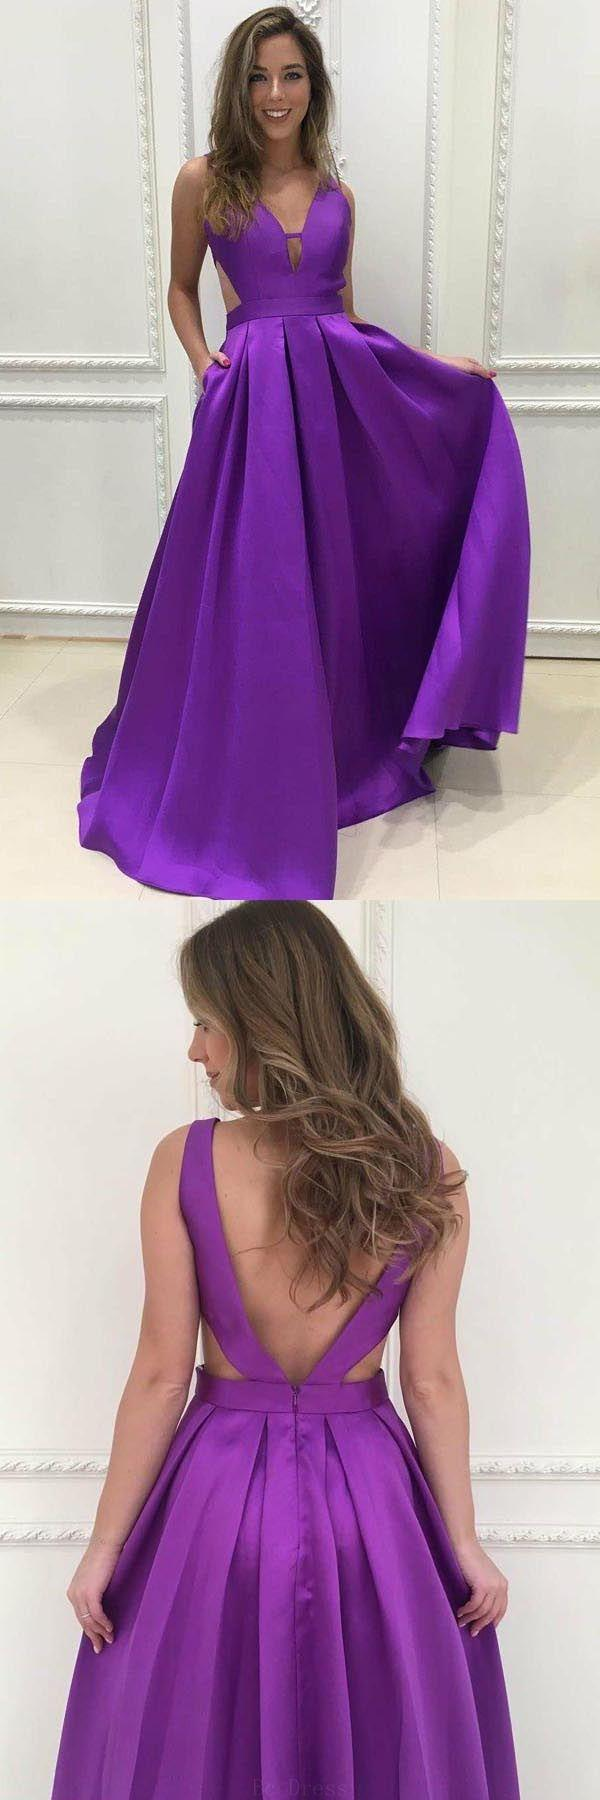 Hochzeit - Discount Outstanding Prom Dresses Simple Simple V-Neck Sweep Train Grape Satin Prom Dresses Evening Dresses